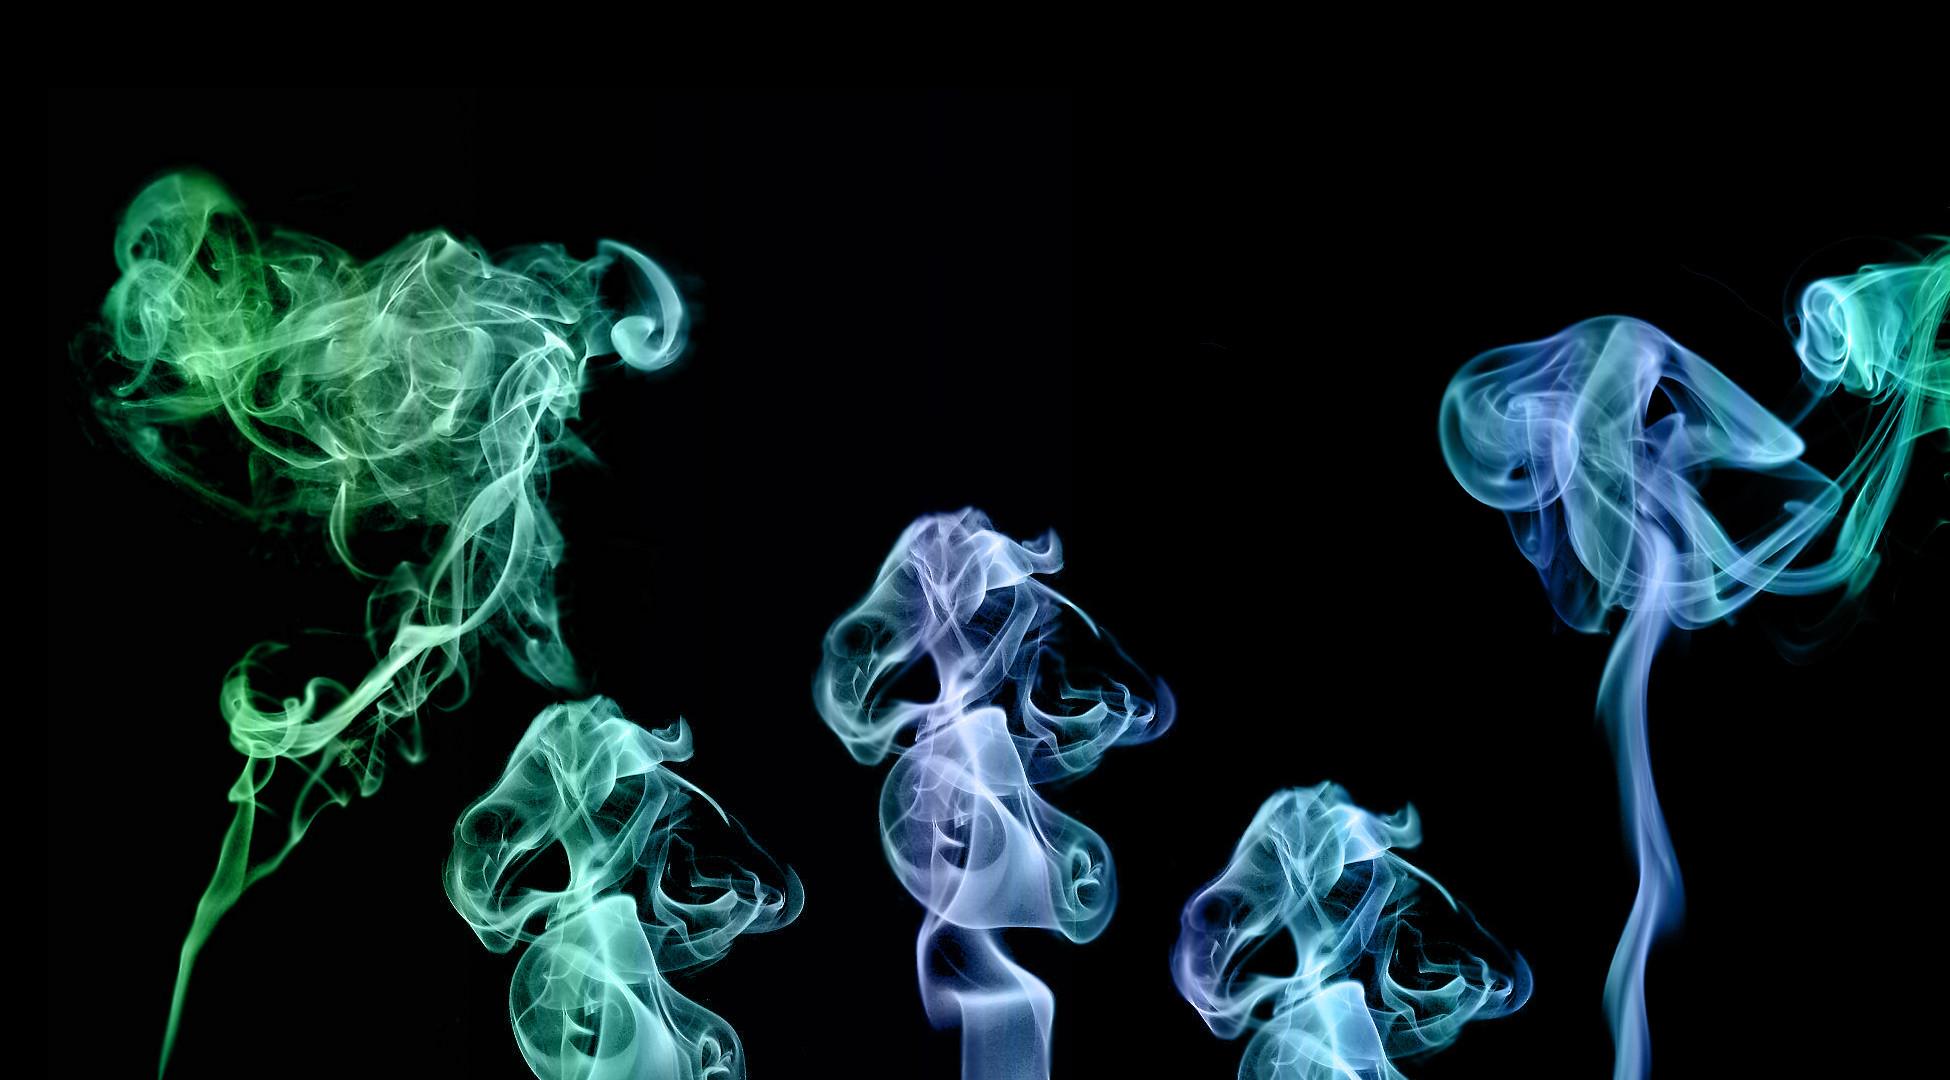 Just a large desktop sized colorful smoke rising image.